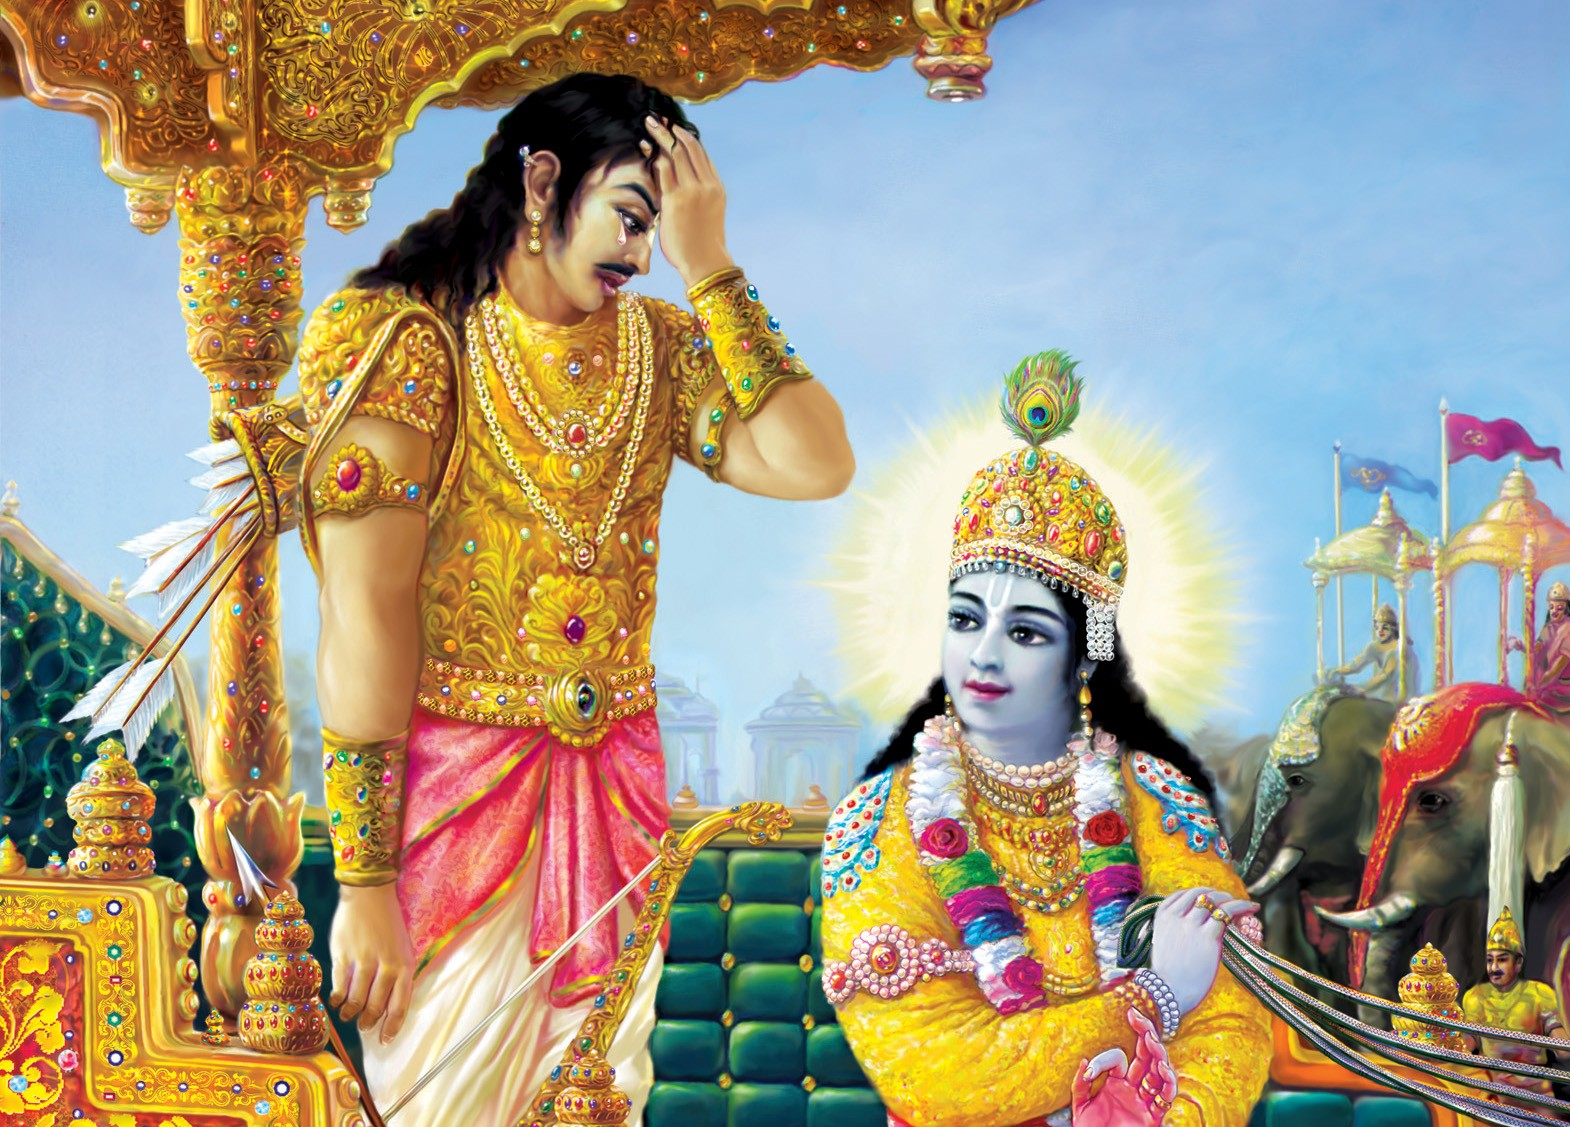 PunjabKesari, Shrimad Bhagwat Gyan, Shrimad Bhagwat, Shrimad Bhagwat gyan in hindi, भगवद्गीता, श्रीमद् भागवत, Mantra Bhajan Aarti, Vedic Mantra in hindi, Vedic Shalokas